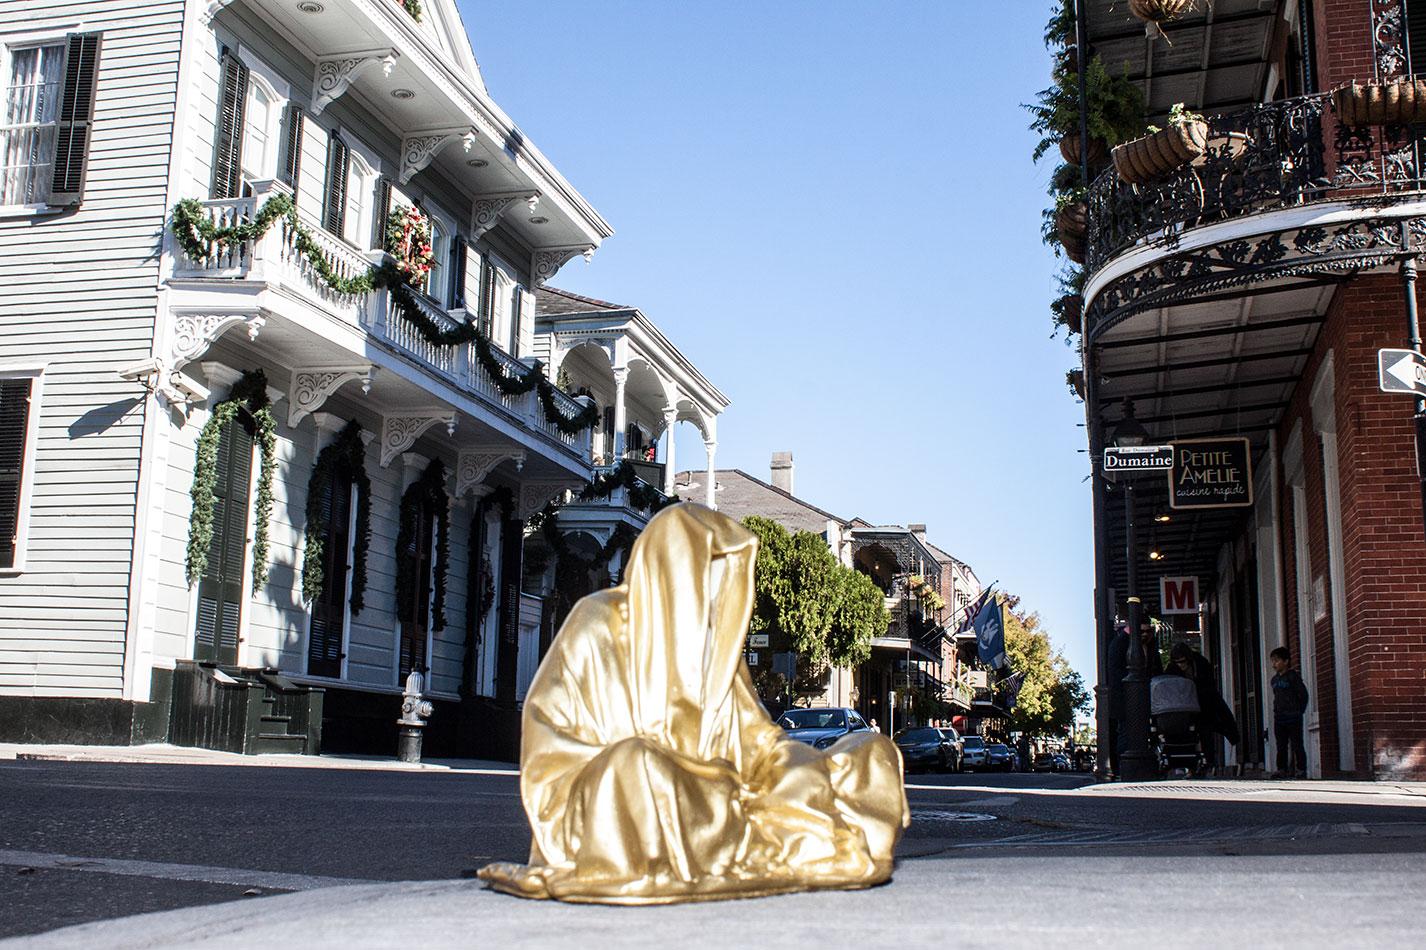 public-art-show-New-Orleans-Louisiana-usa-guardians-of-time-manfred-kili-kielnhofer-contemporary-fine-art-modern-arts-design-antiques-sculpture-5339